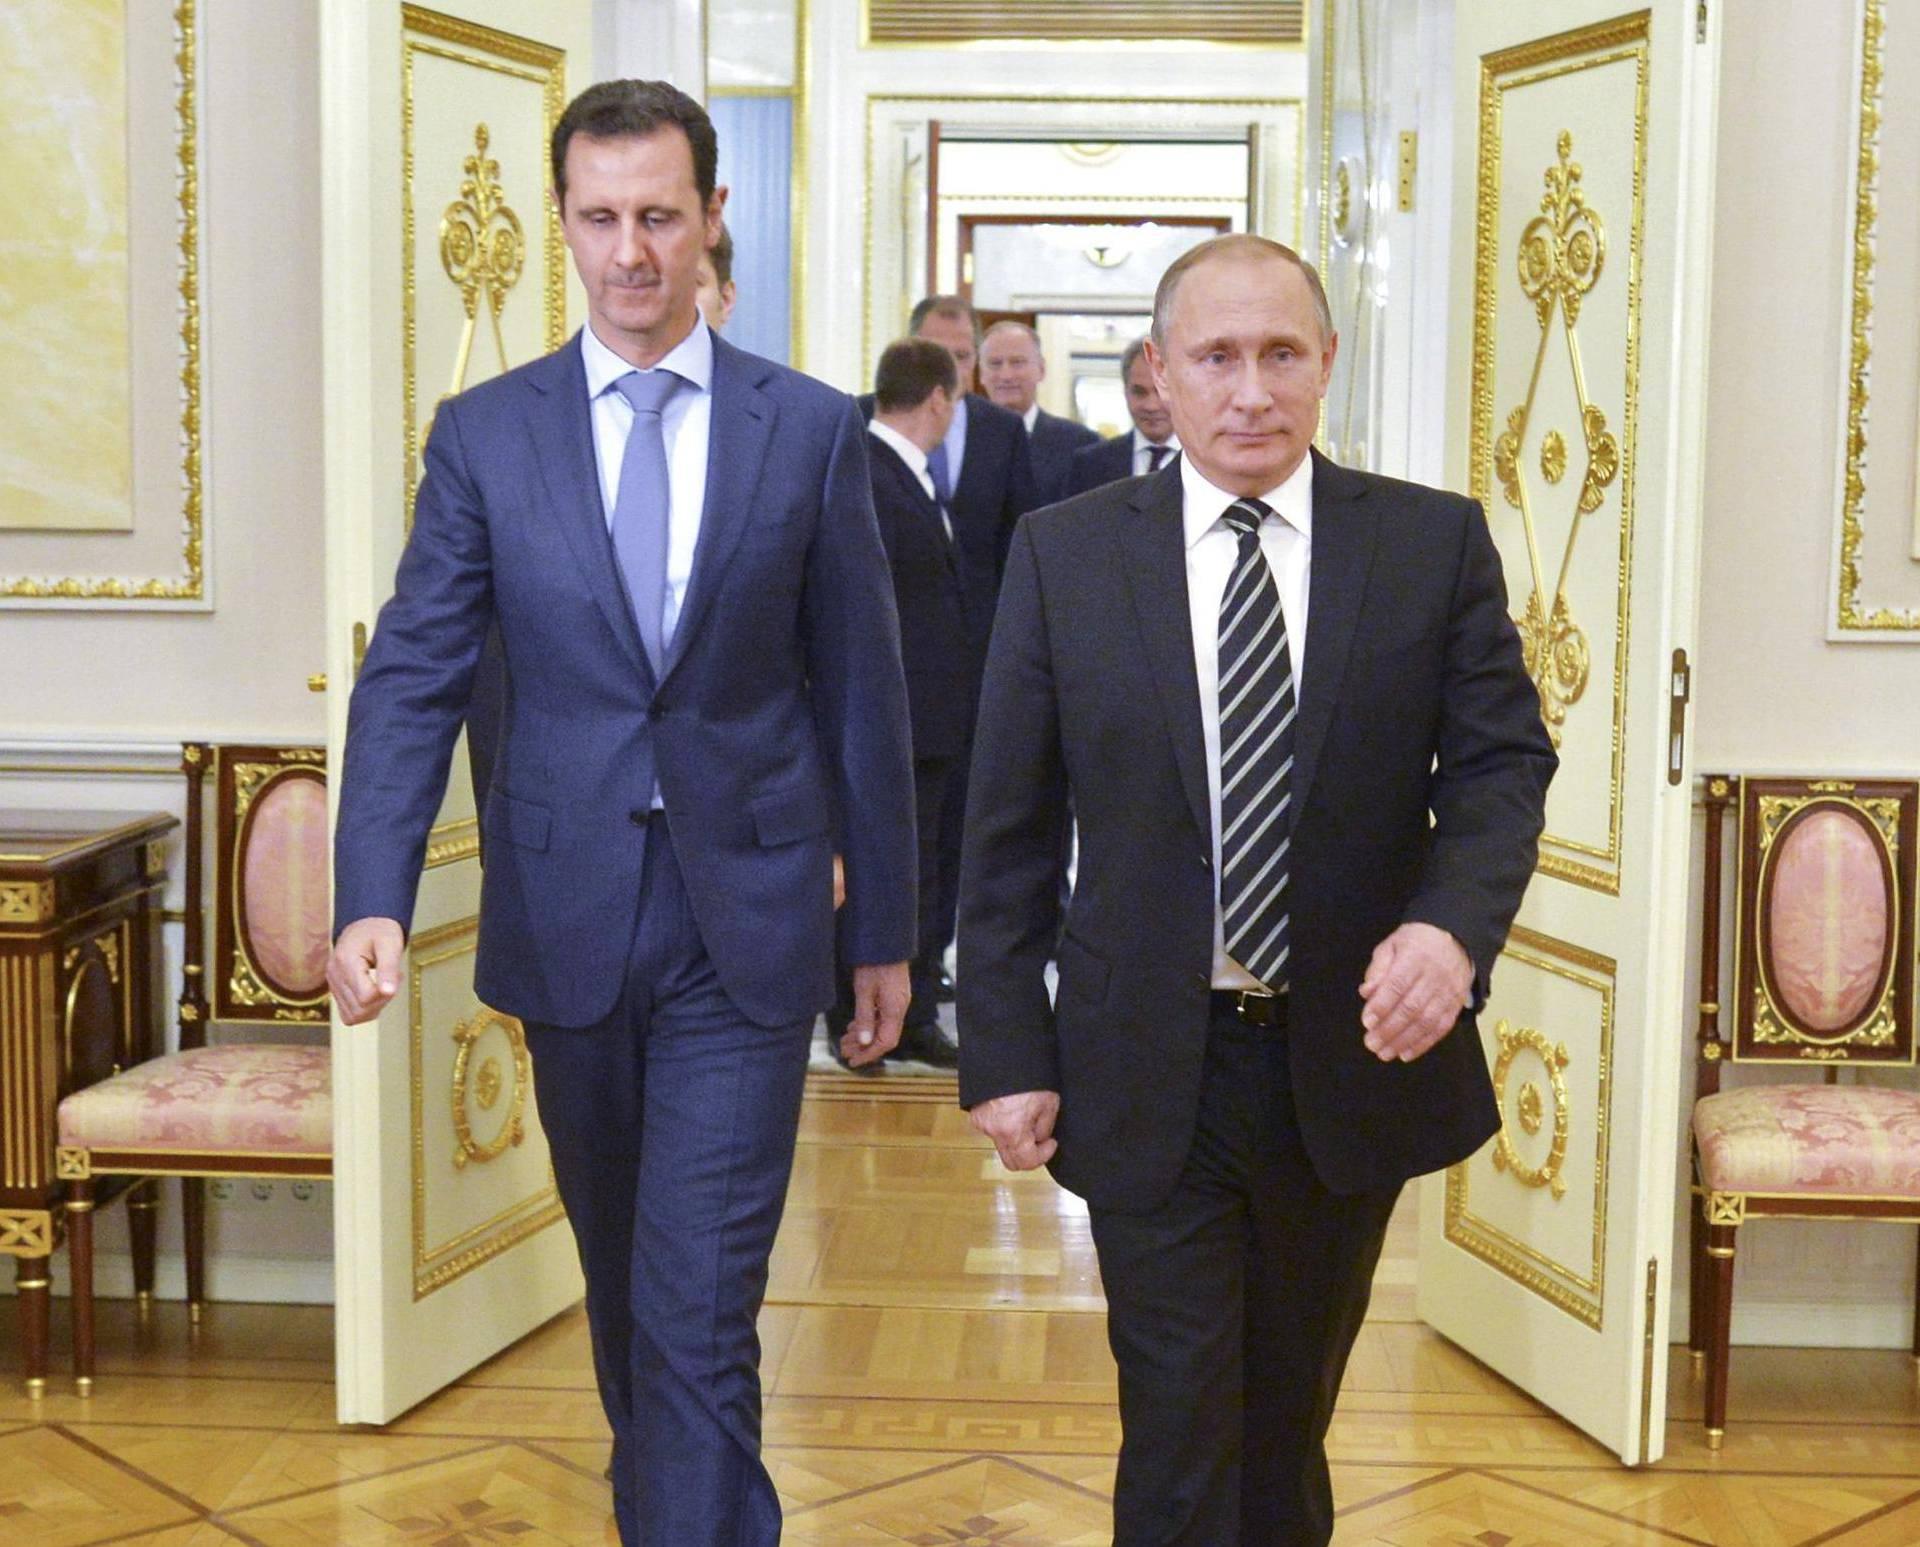 Russian President Vladimir Putin and Syrian President Bashar al-Assad enter a hall during a meeting at the Kremlin